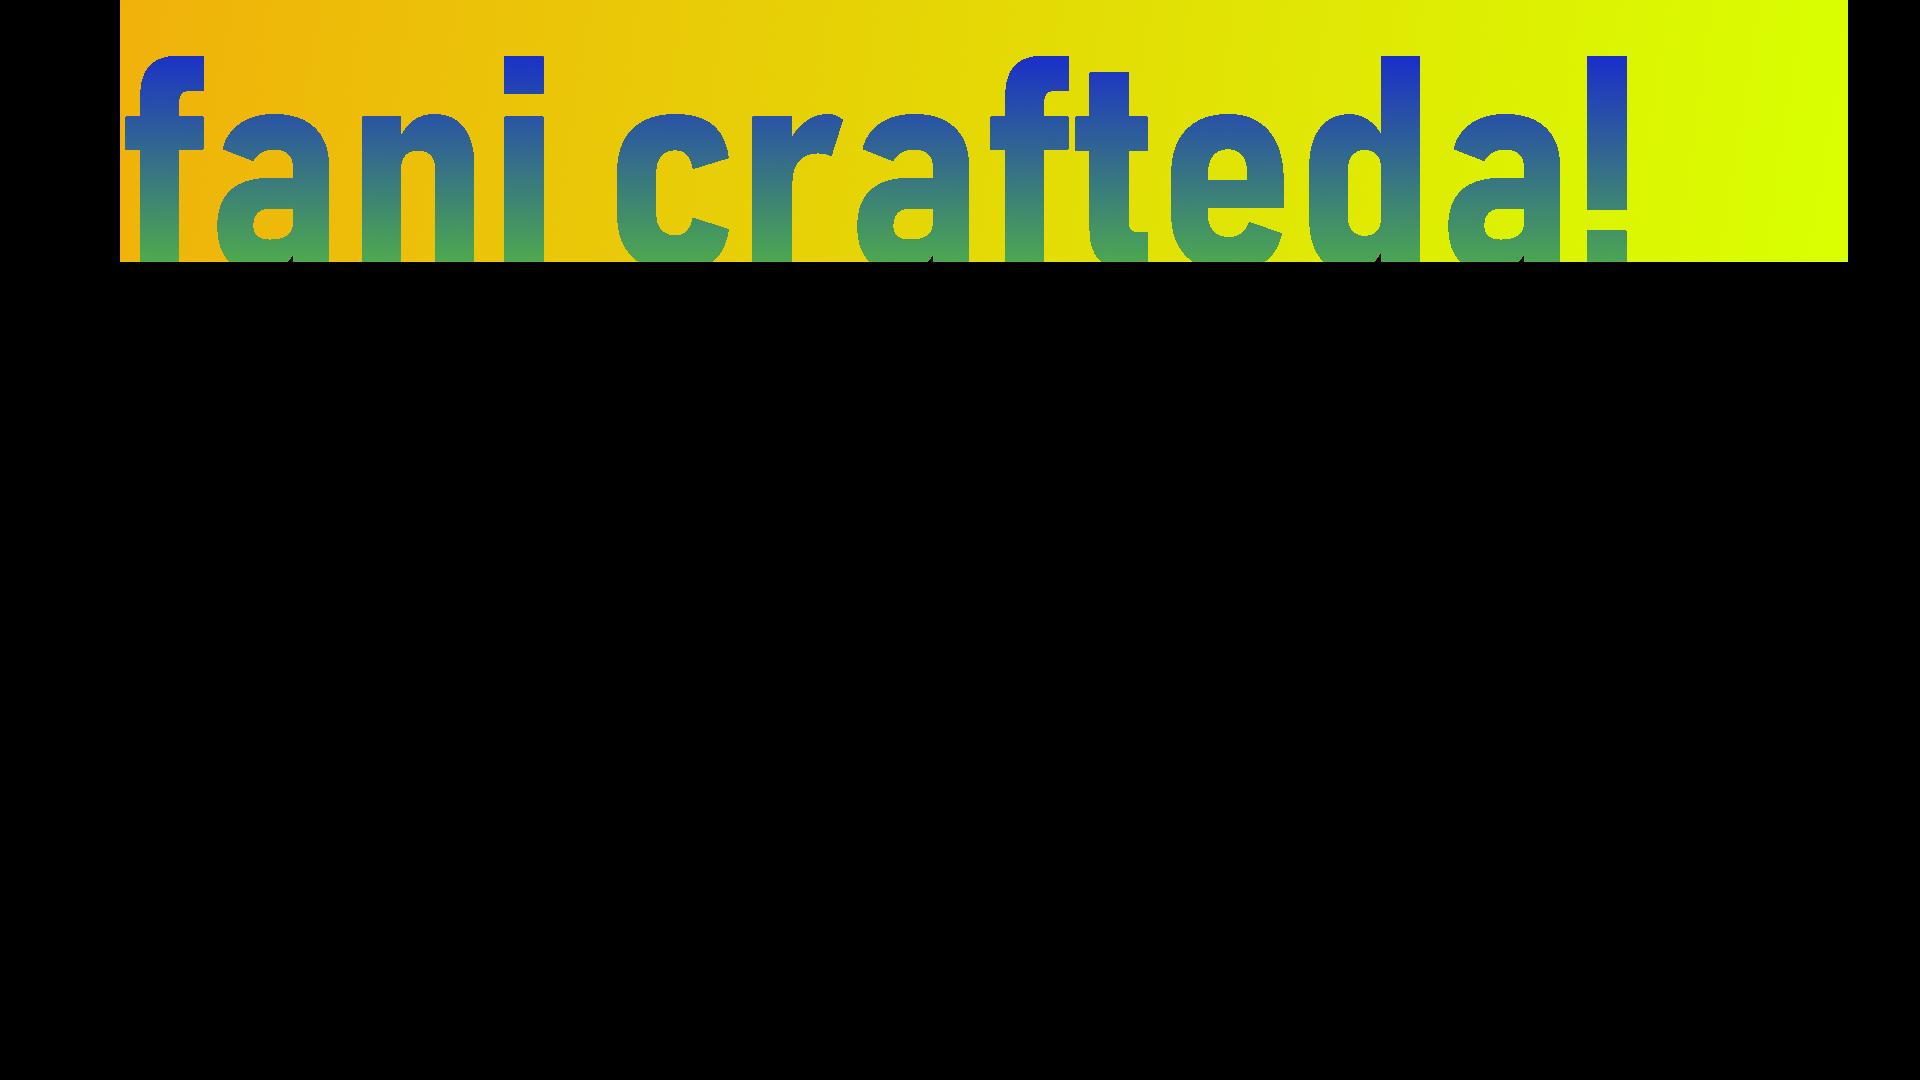 Fani Crafteda